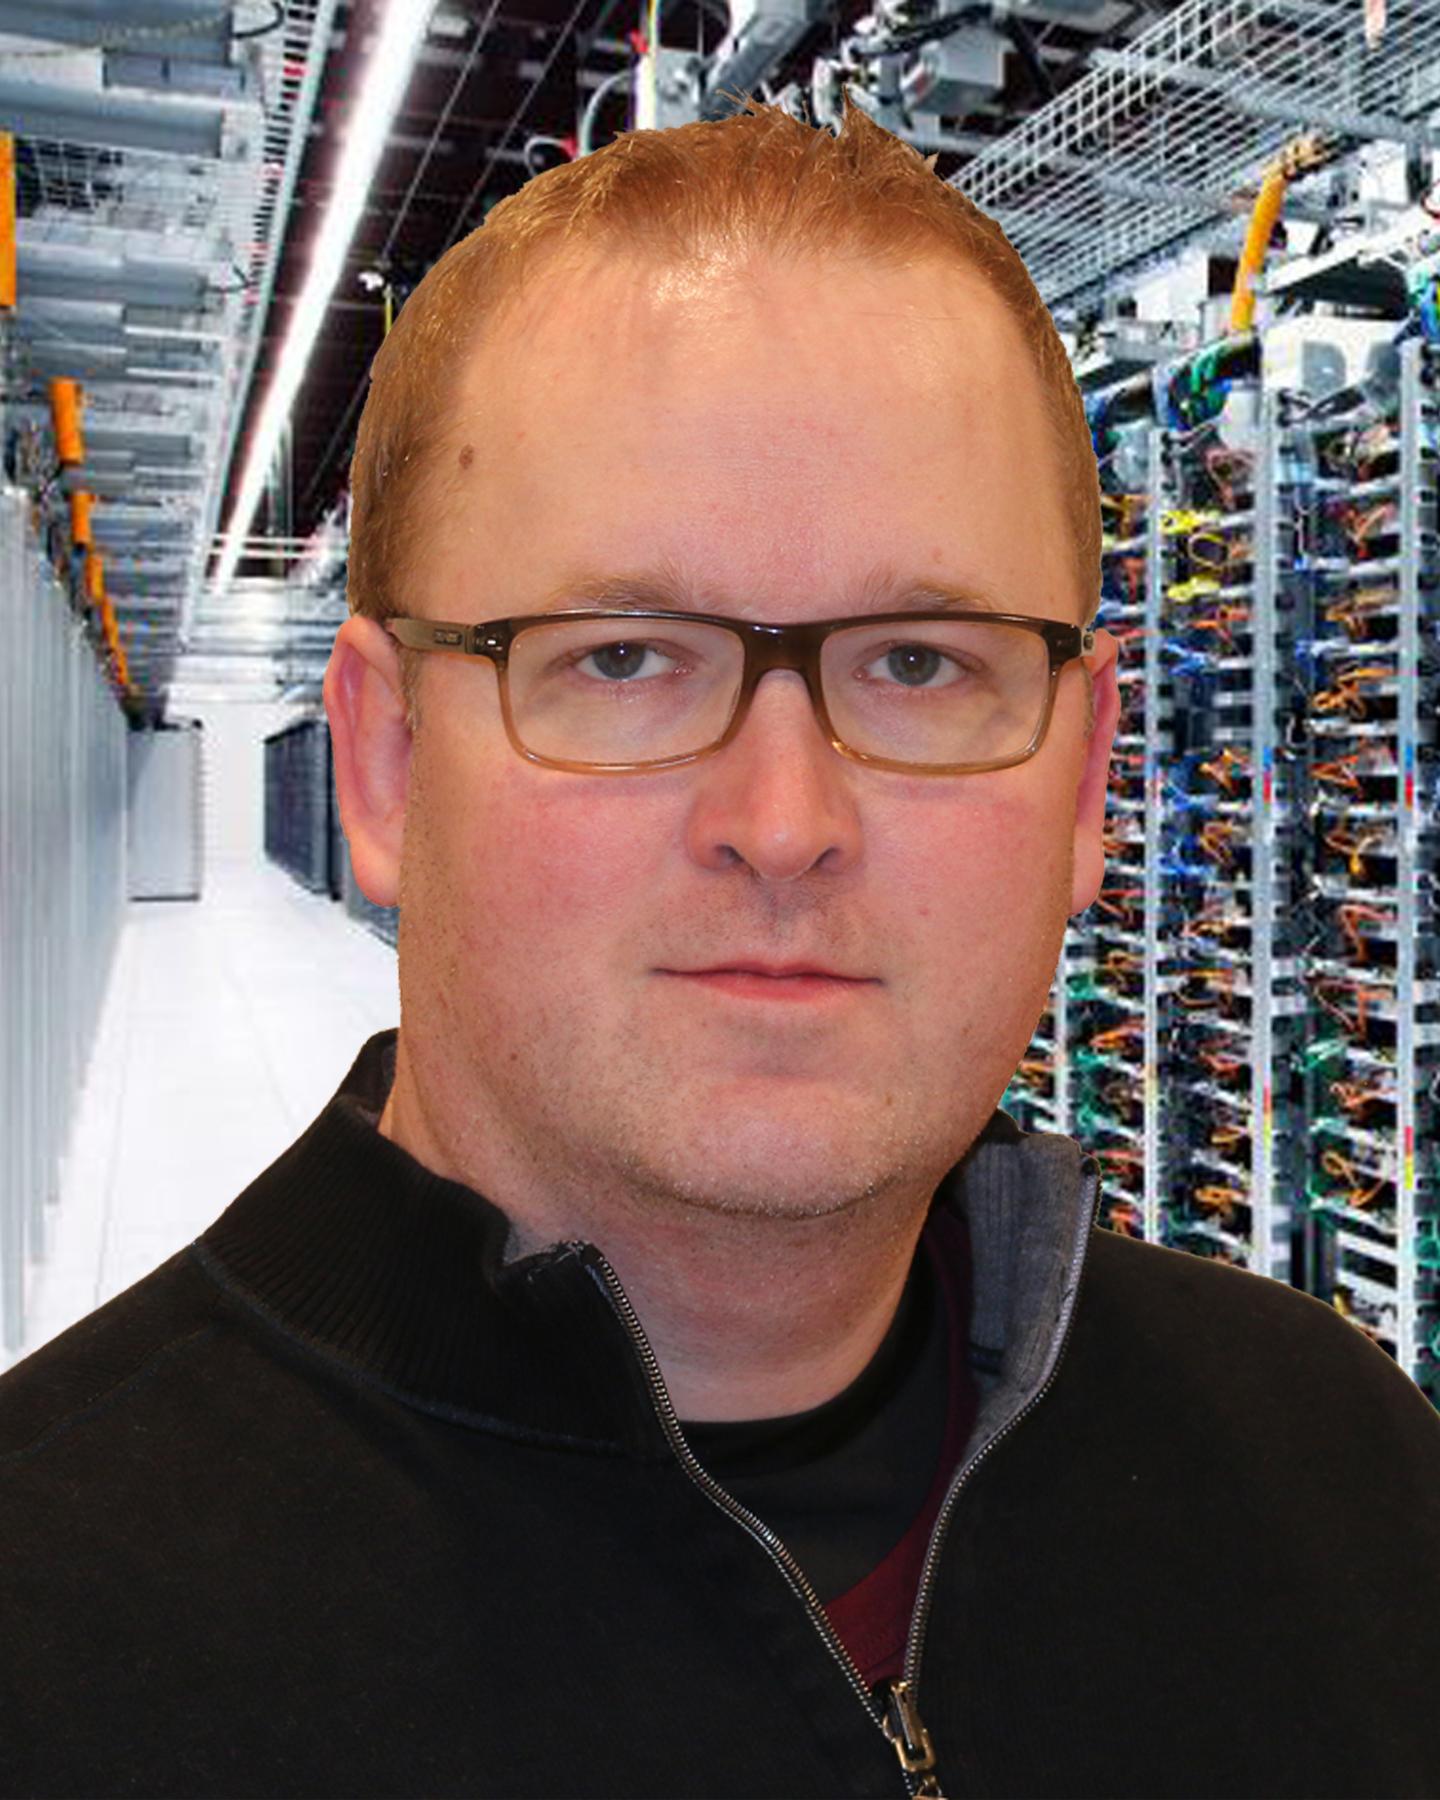 Jim Range, Software Engineer